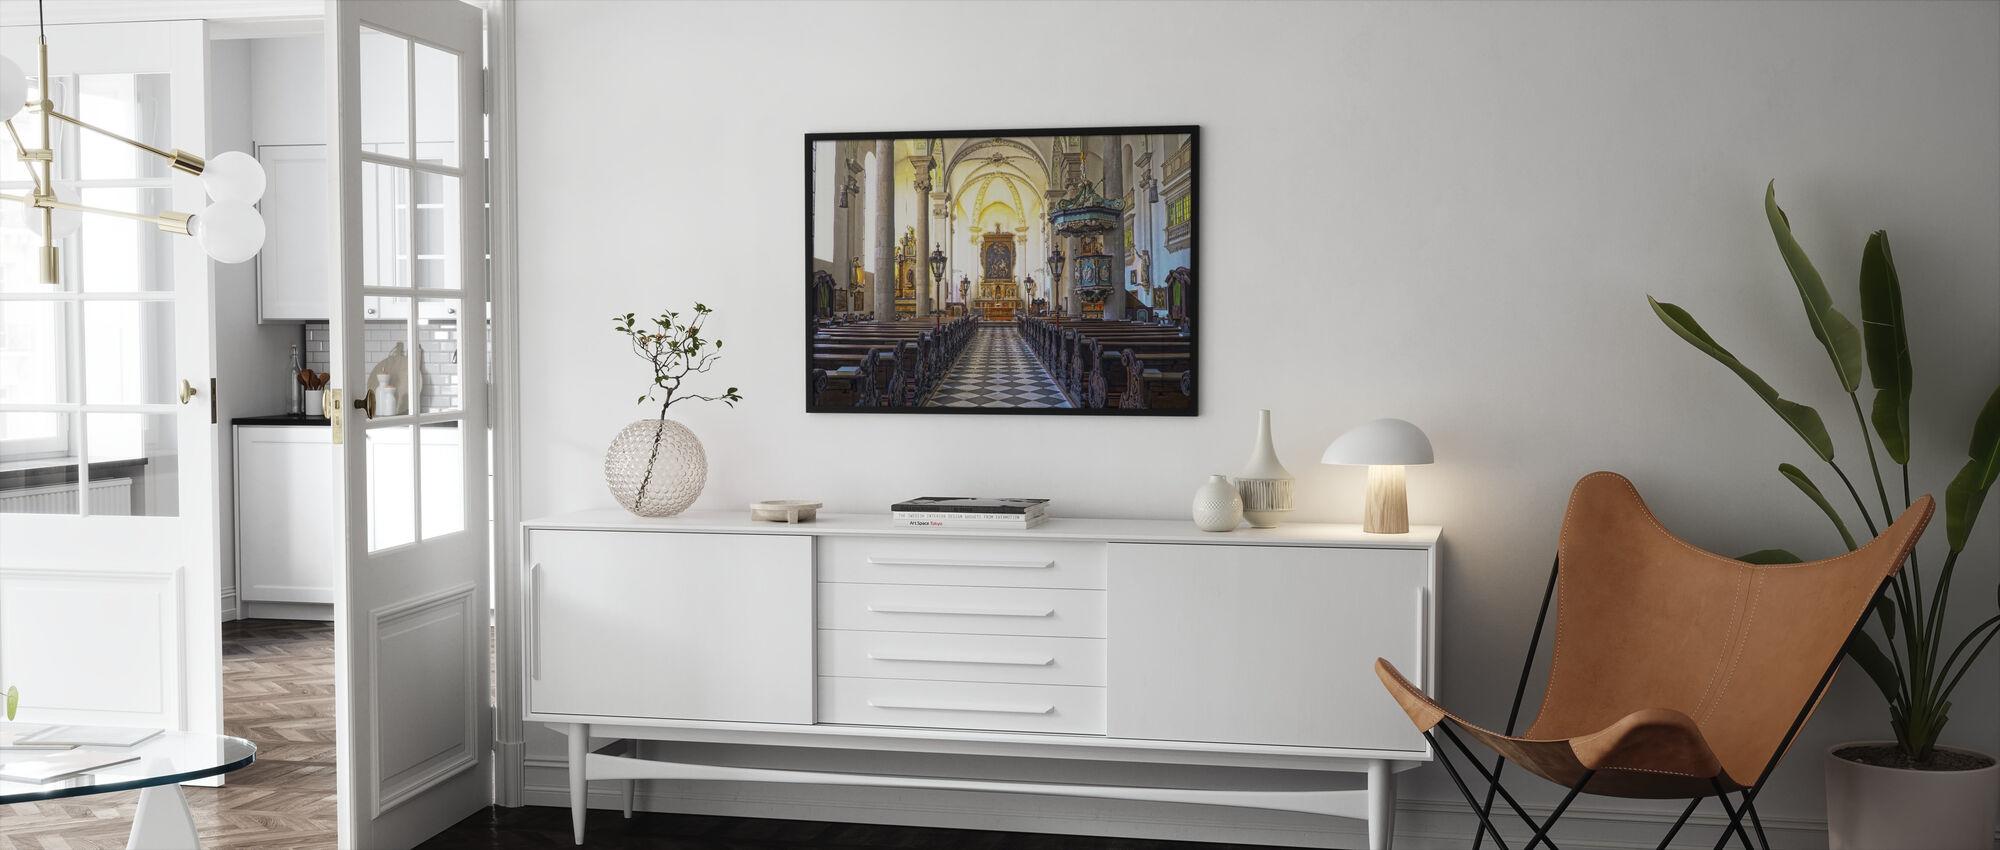 Church Pews - Framed print - Living Room